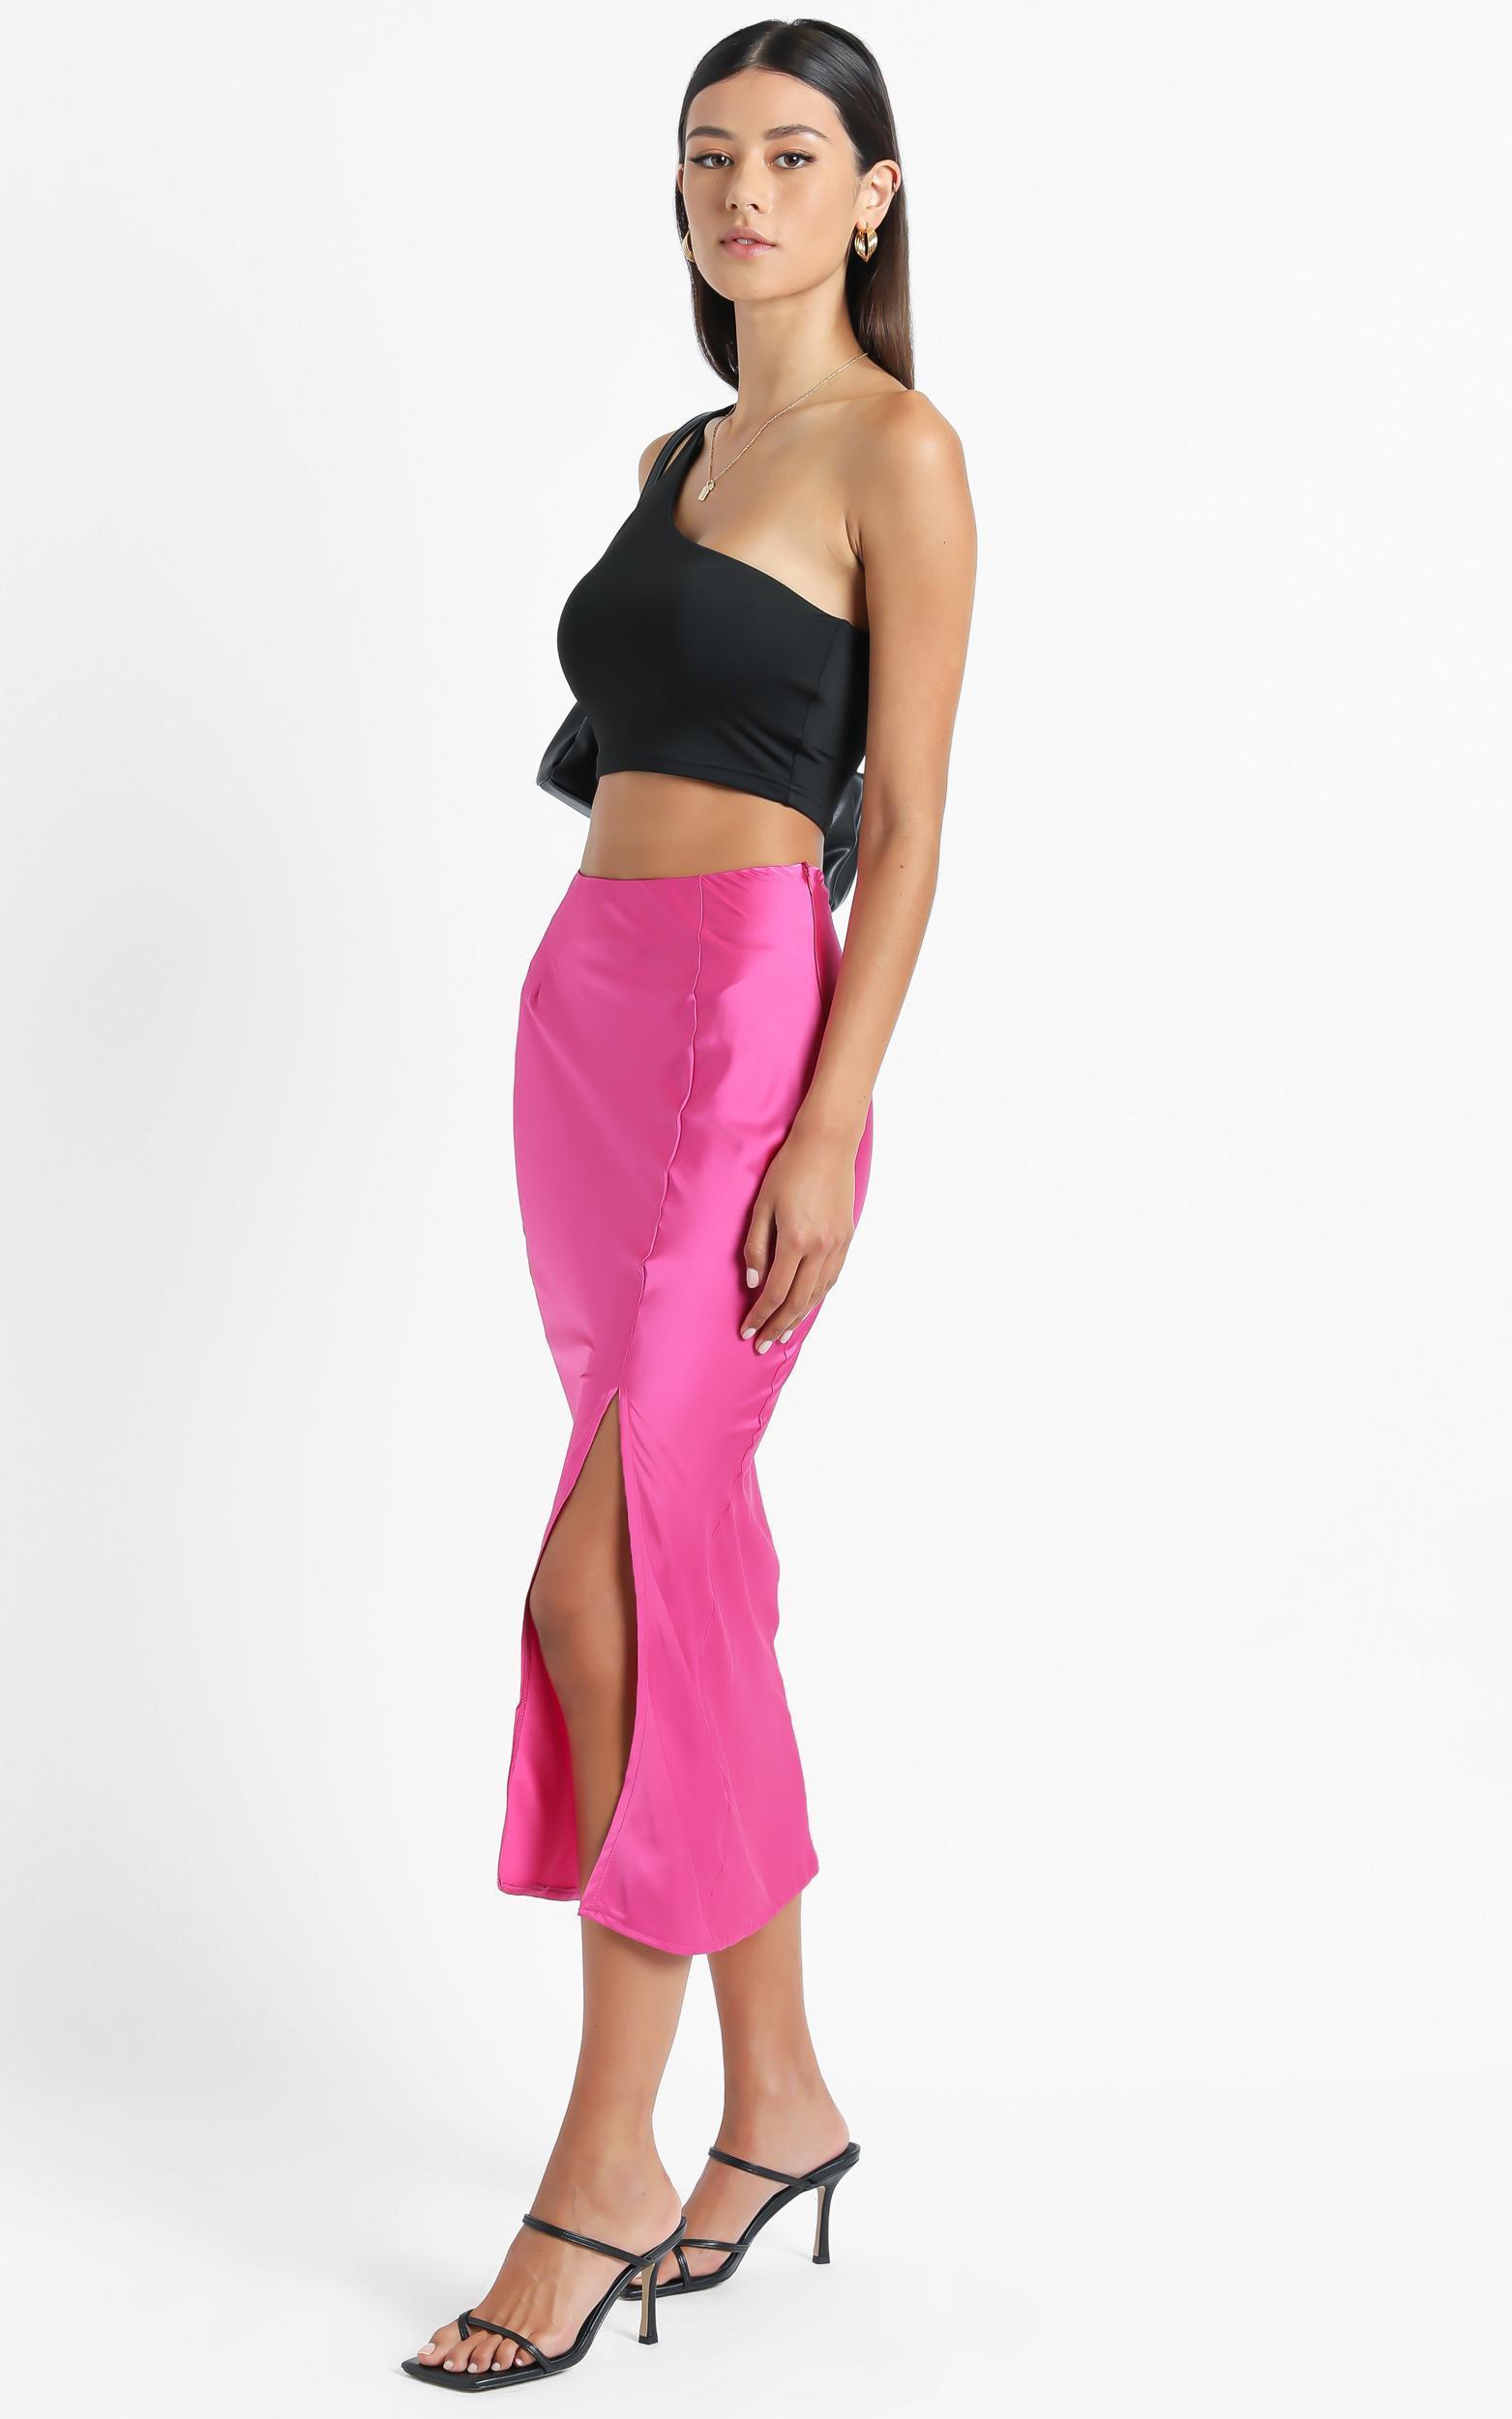 Diara Skirt in Pink - 06, PNK2, hi-res image number null